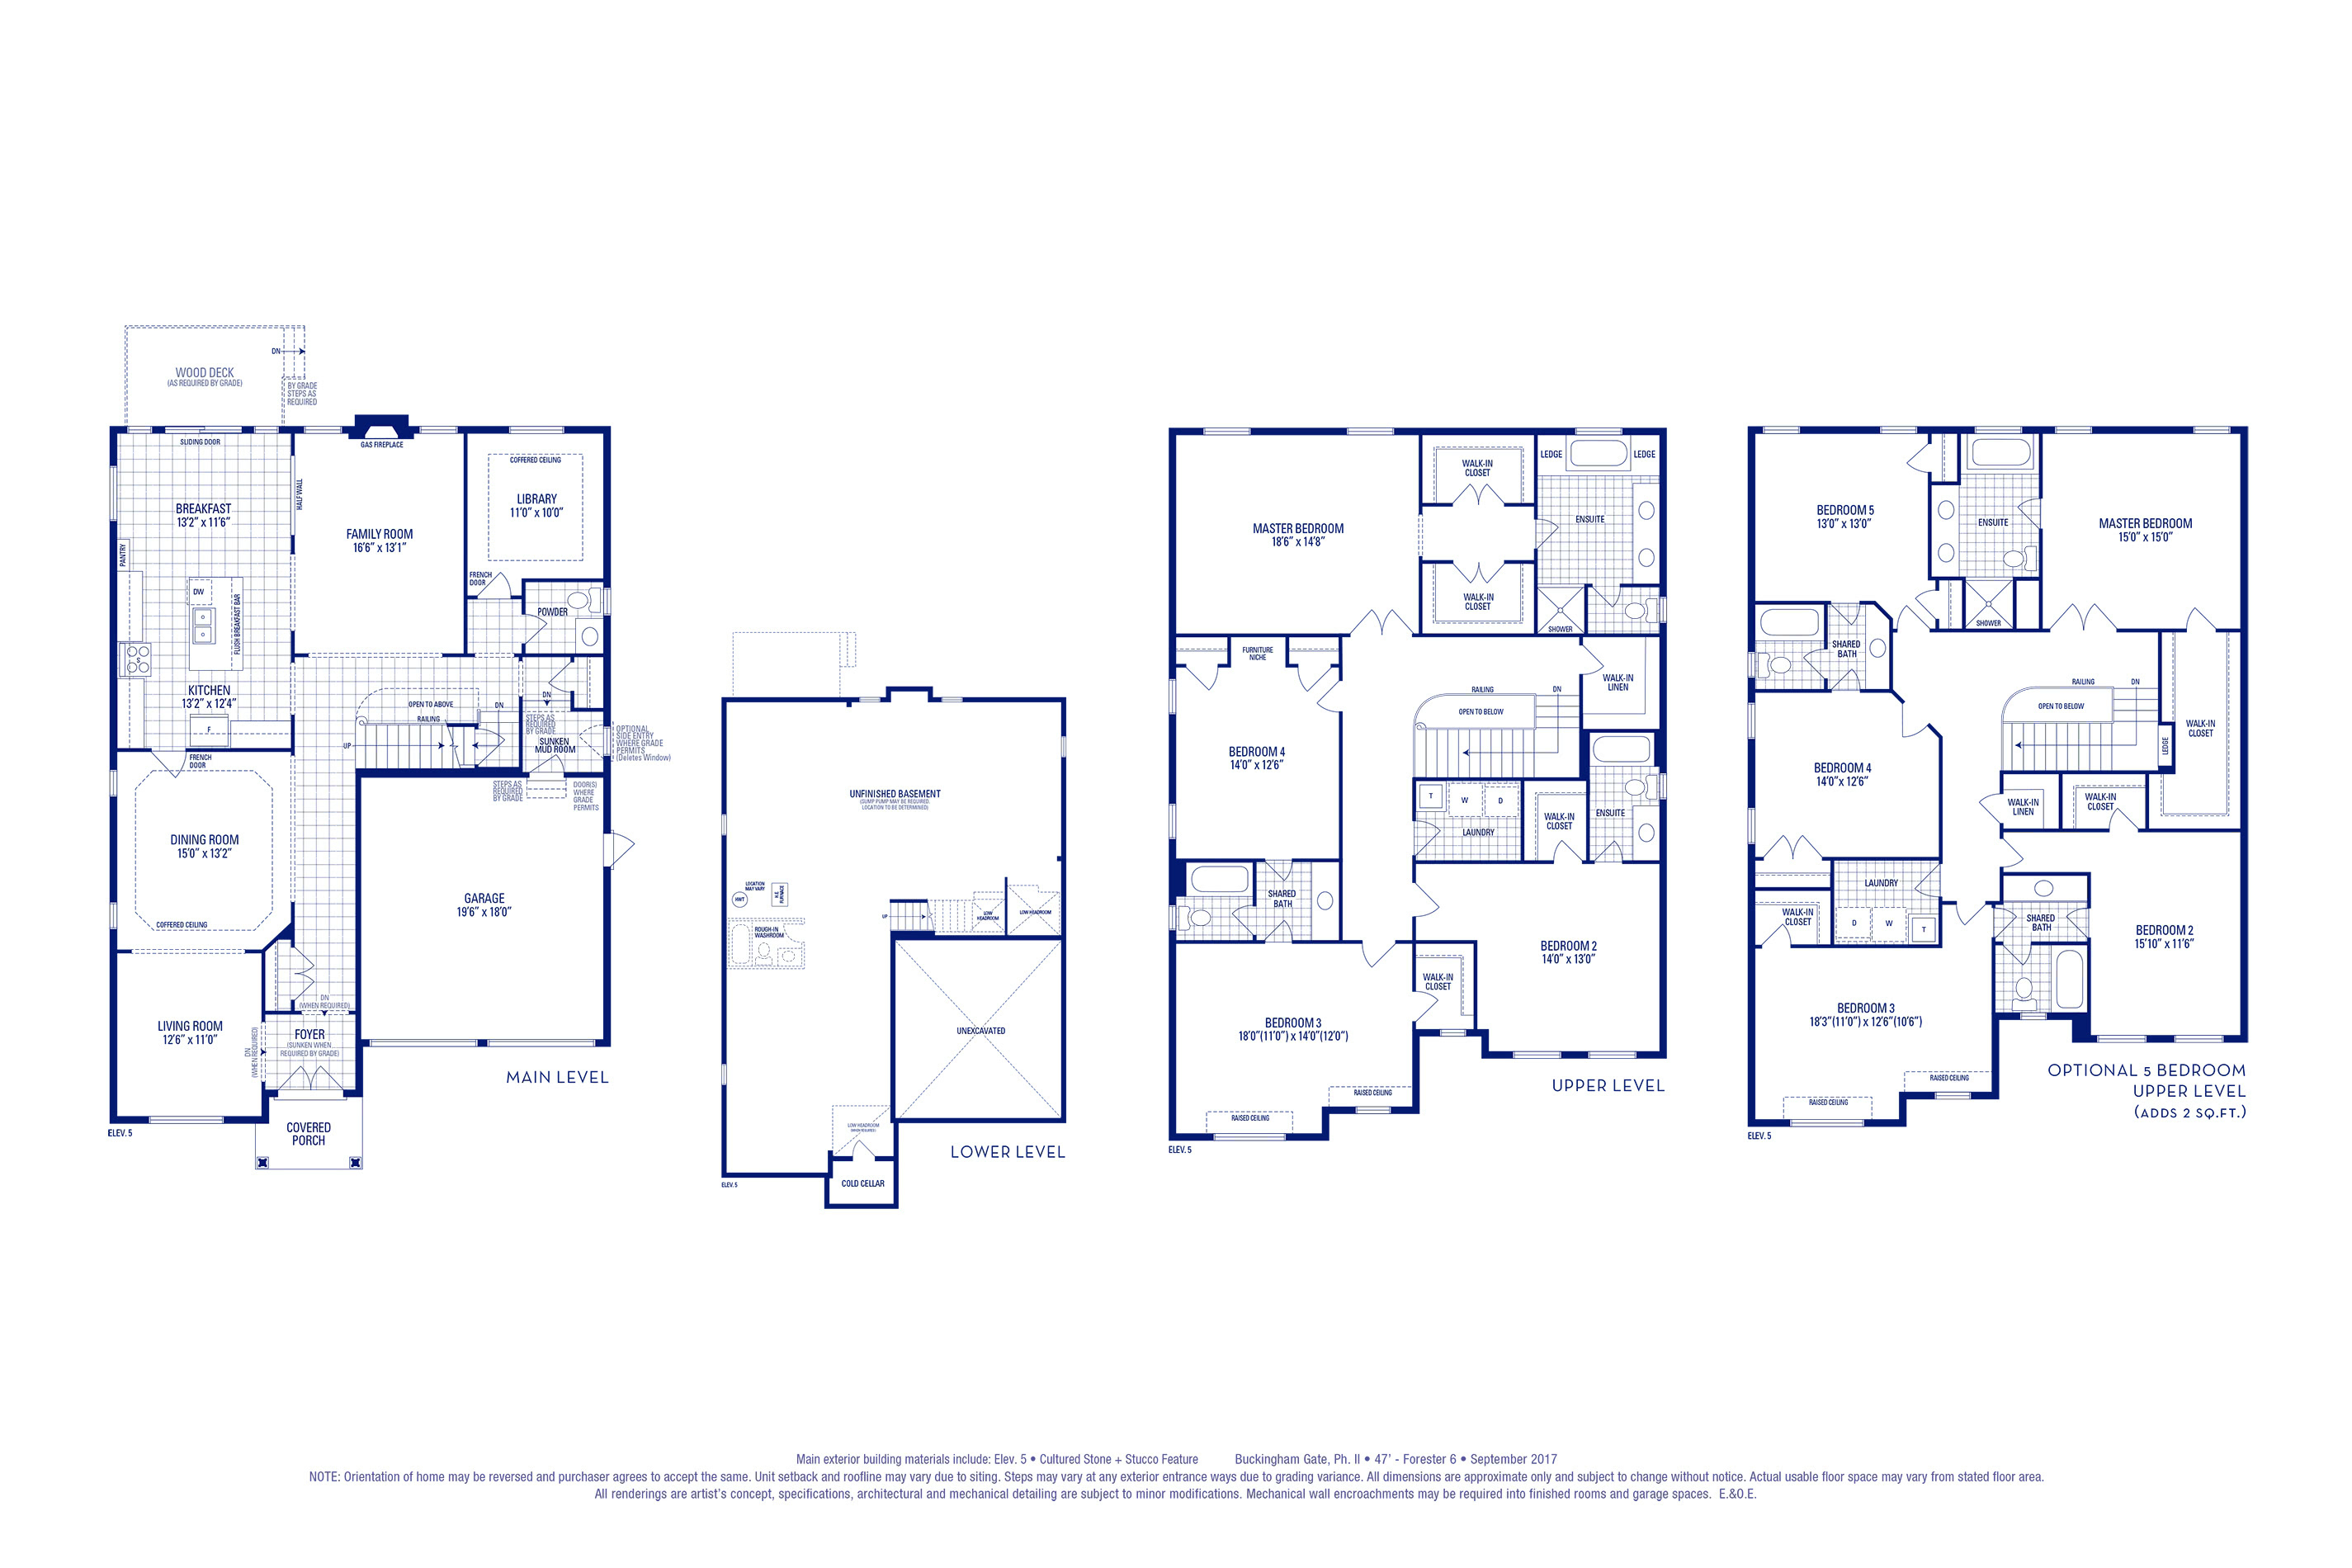 Forester 06 Elev. 5 Floorplan Thumbnail